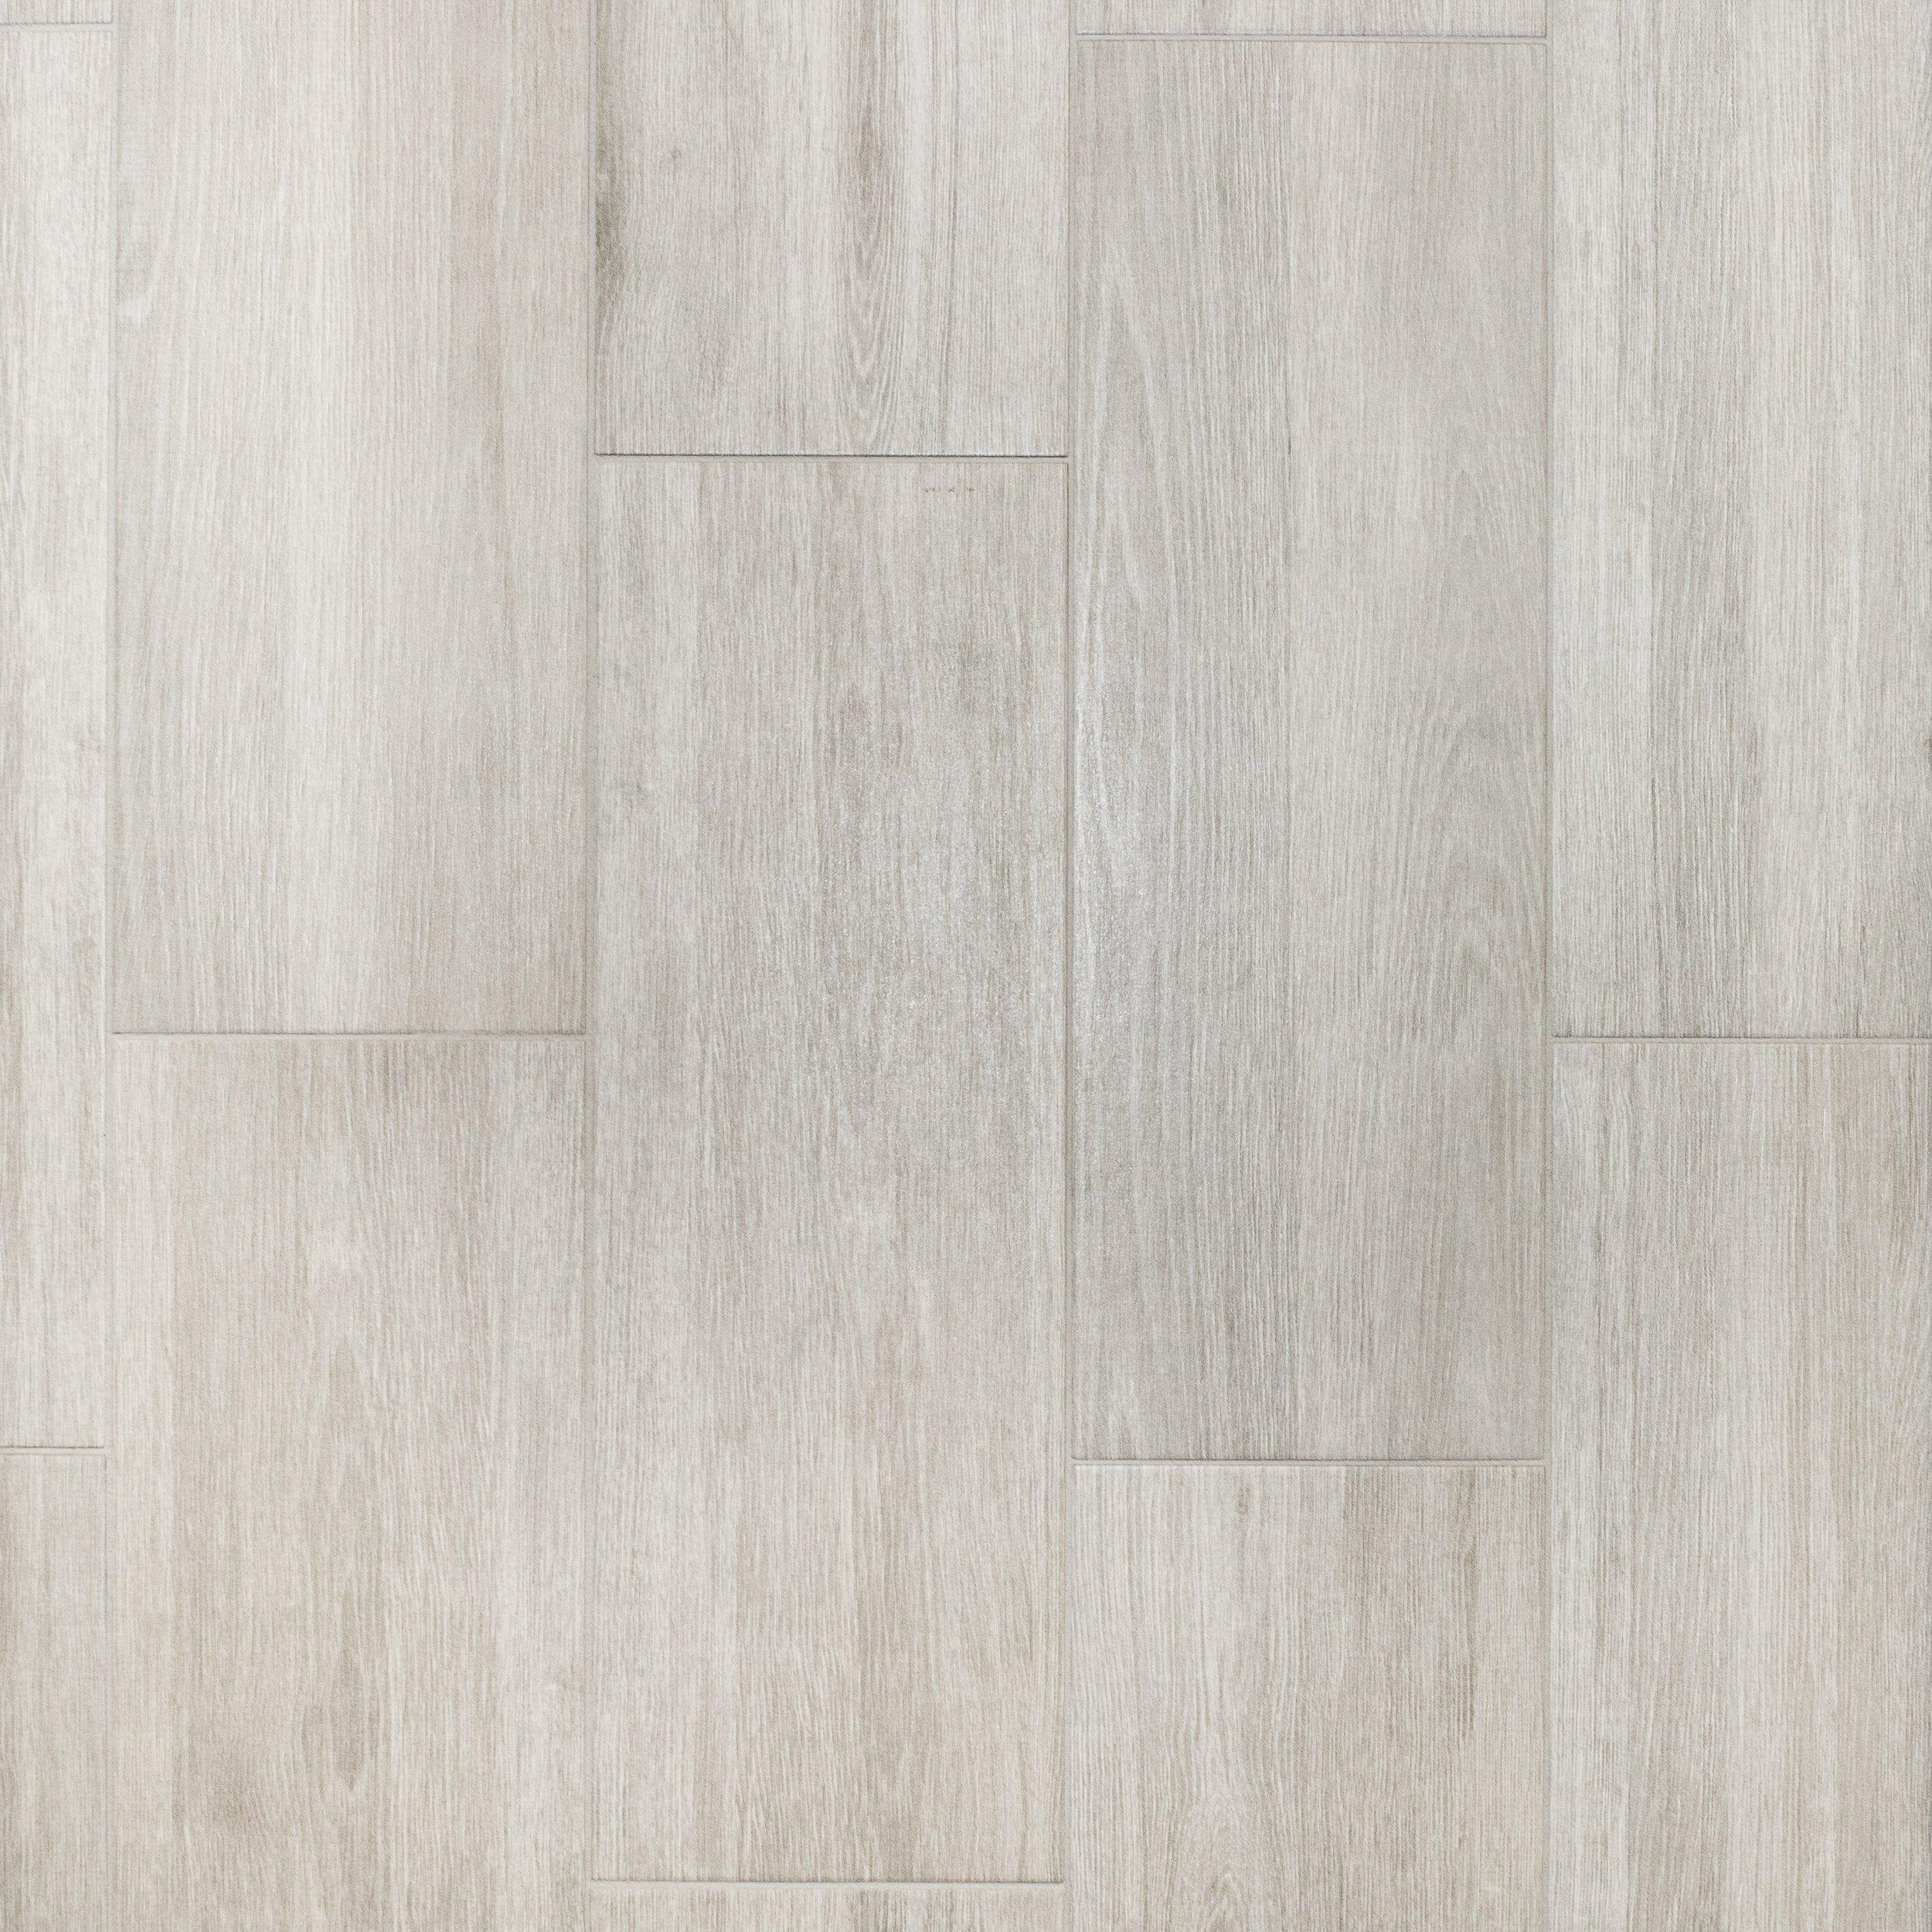 roper sucre suite geo fired earth mocha burford rhodes tiles pin for bathroom patisserie floor